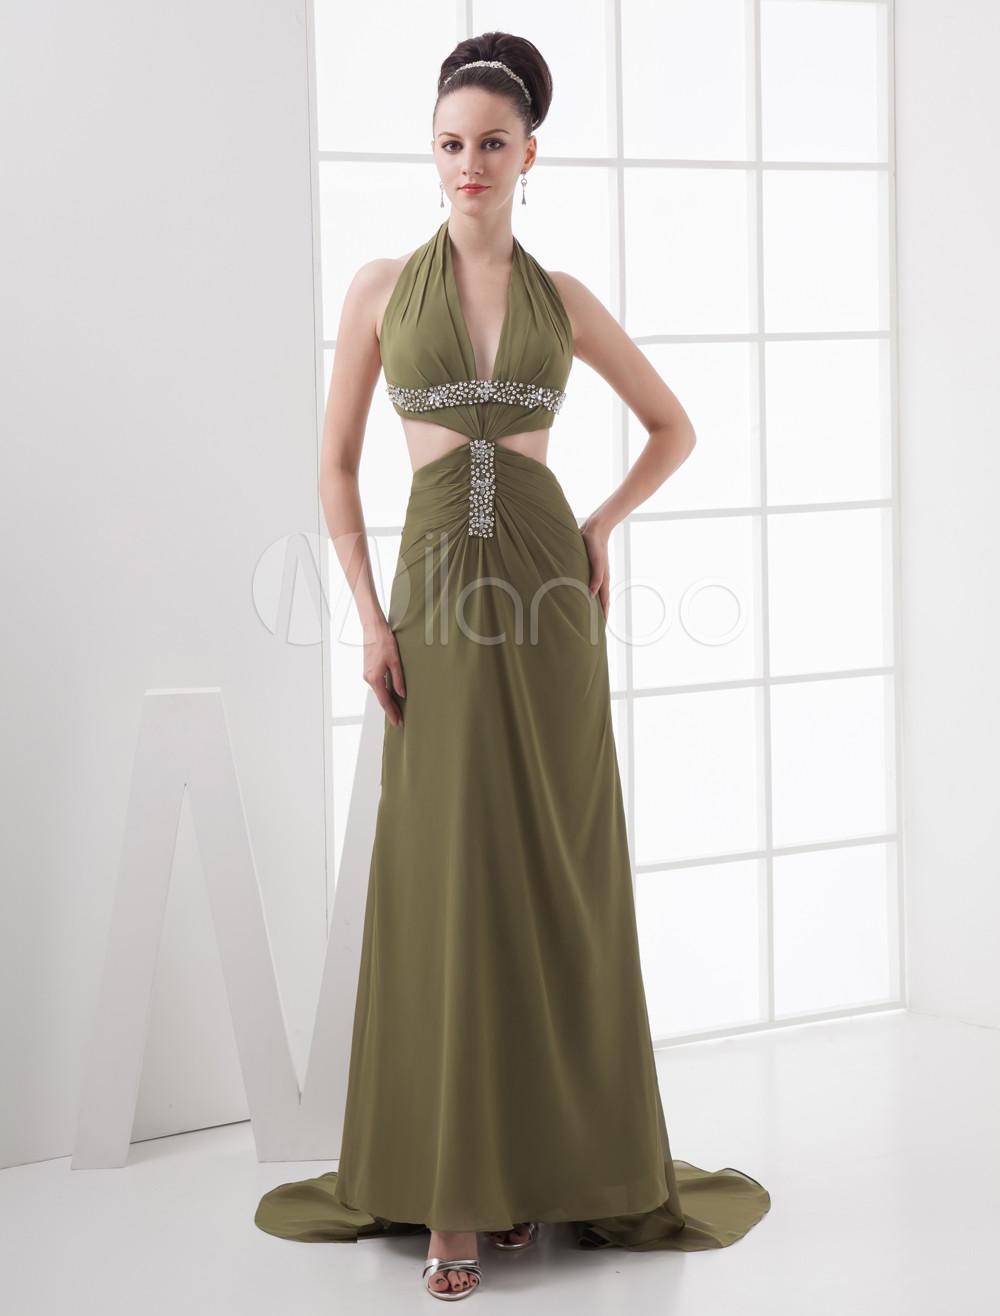 Green Sheath Halter Beading Satin Chiffon Prom Dress (Wedding Prom Dresses) photo